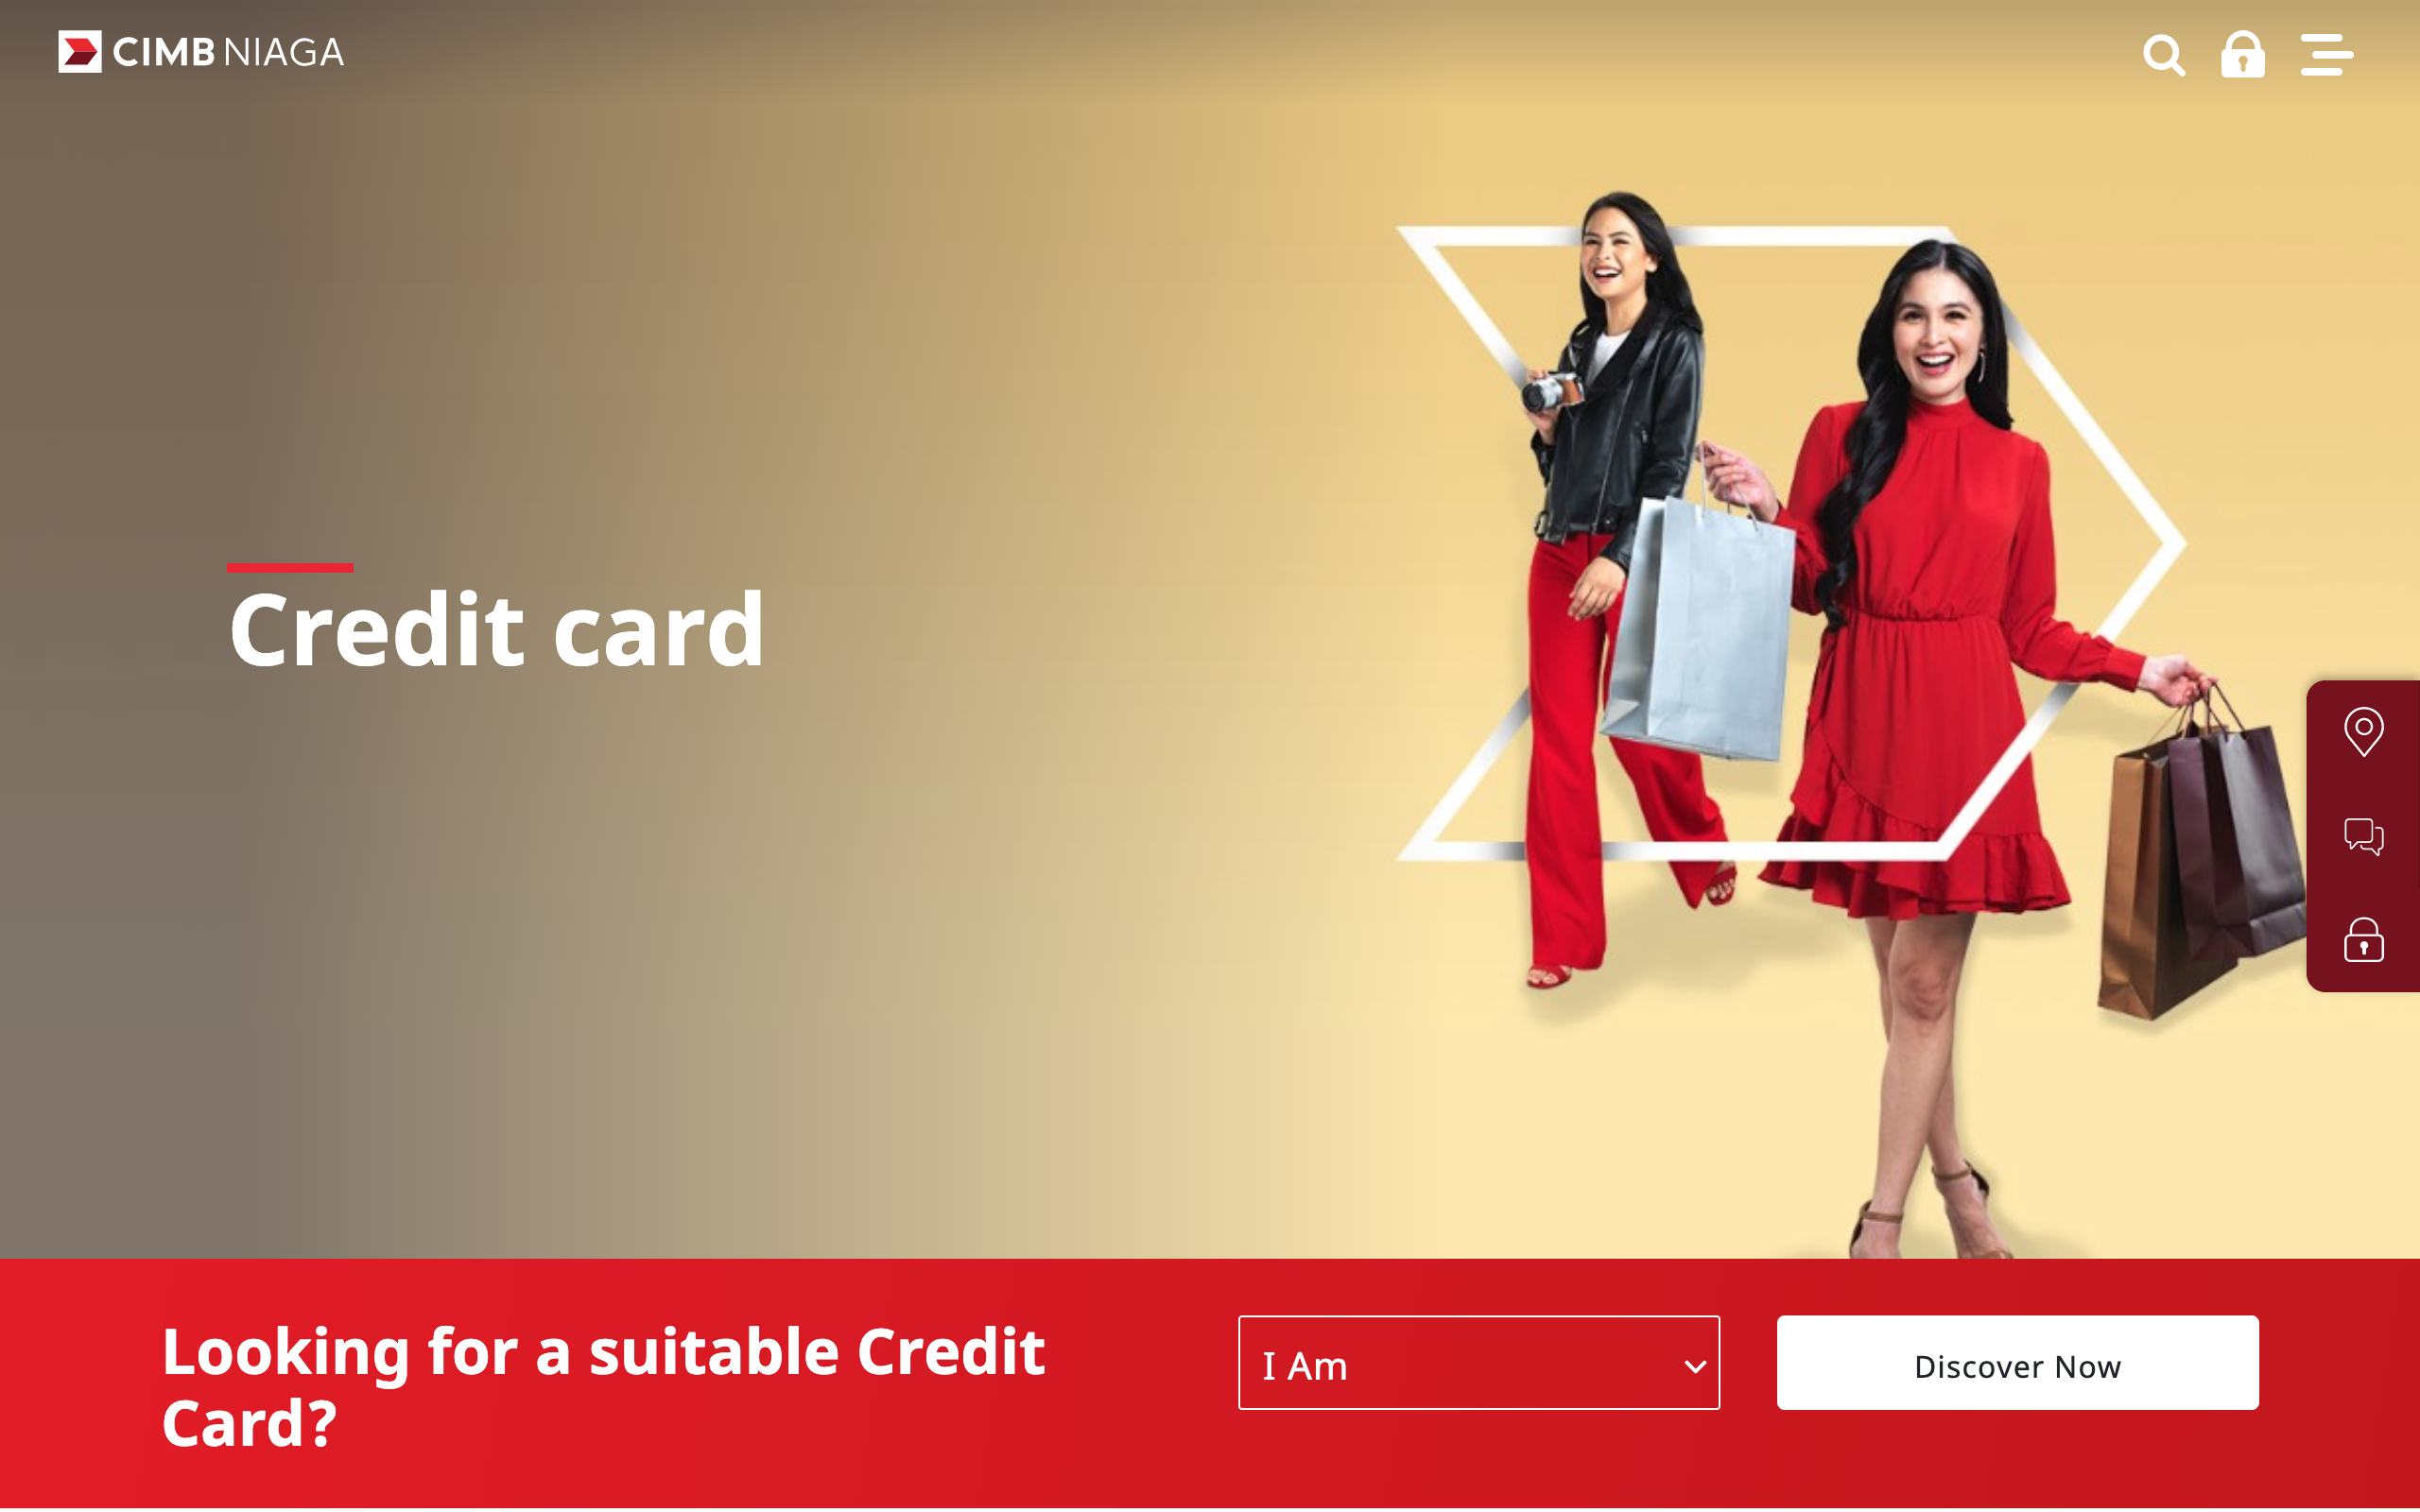 Cara Membaca Tagihan Kartu Kredit CIMB Niaga dengan Mudah